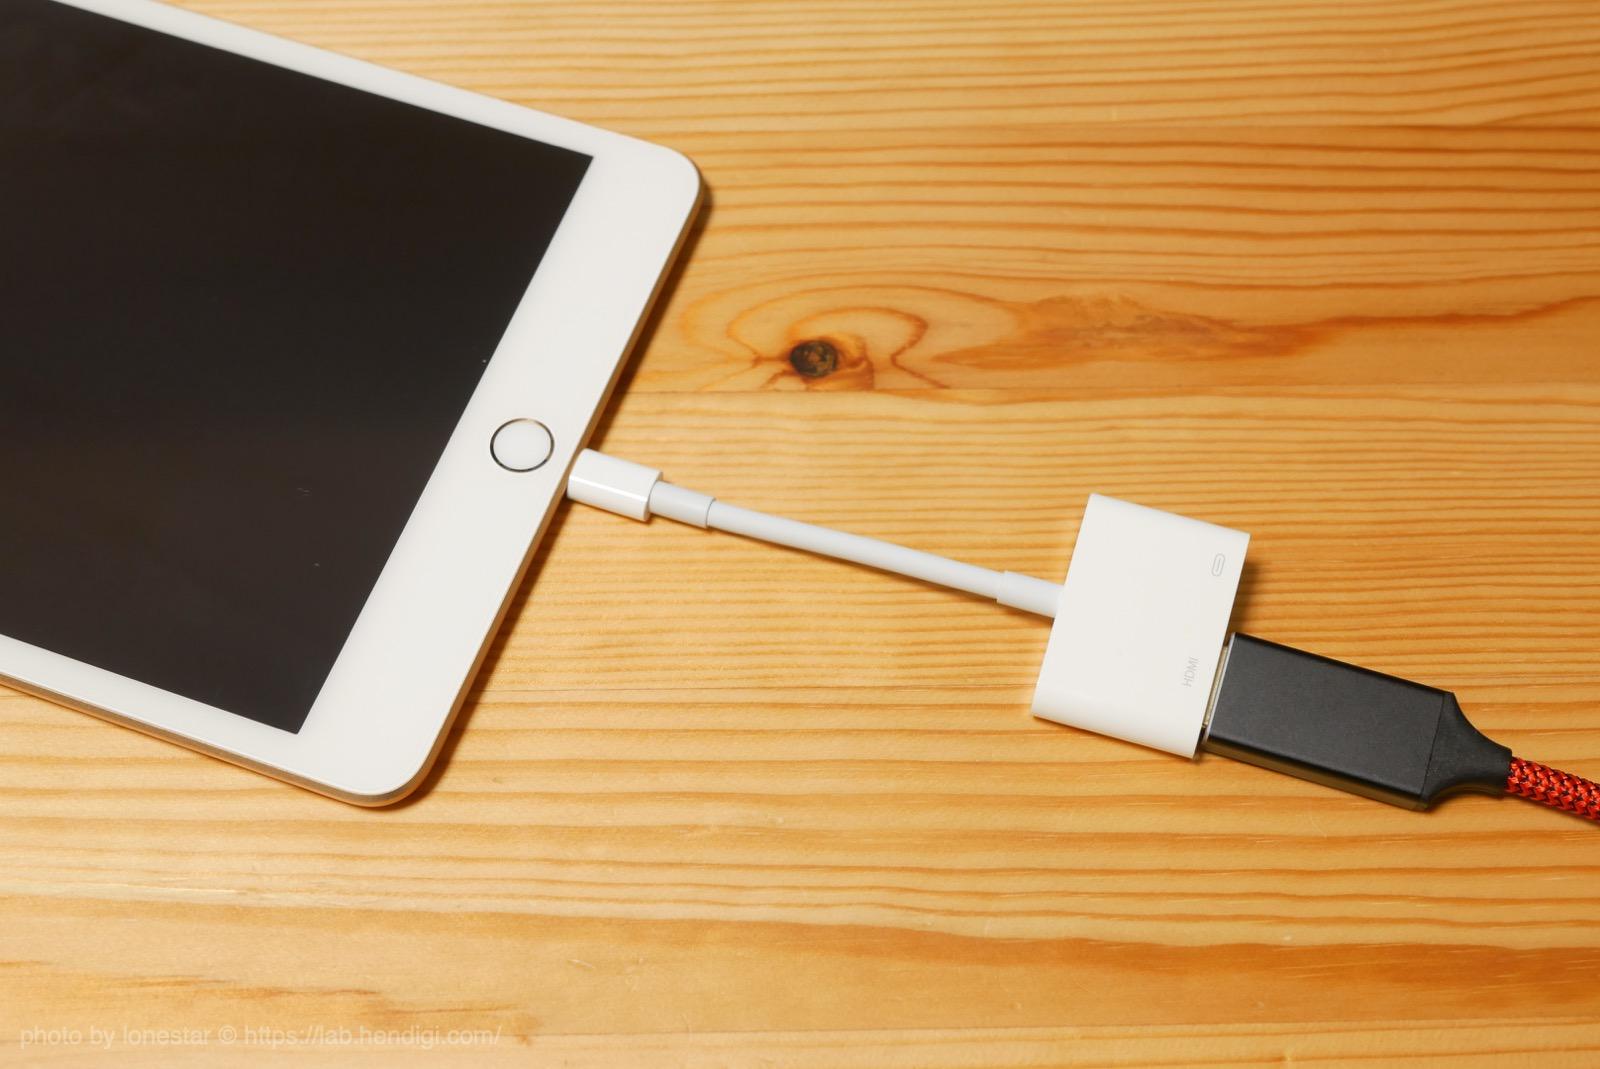 iPad HDMI 接続